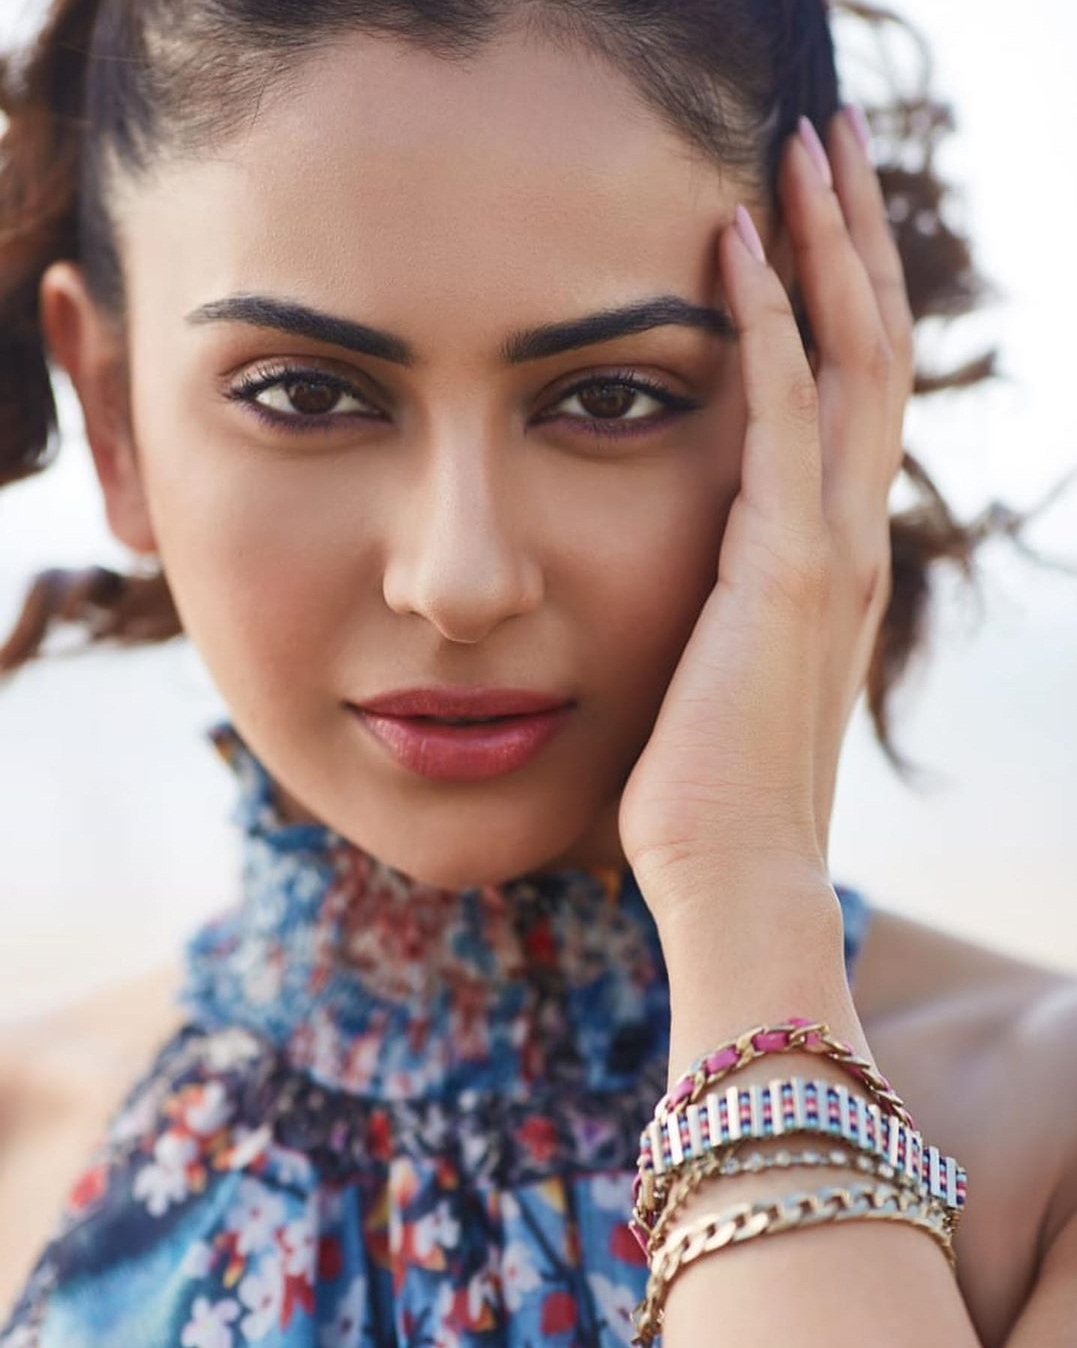 Bollywood Tadka, रकुल प्रीत सिंह इमेज, रकुल प्रीत सिंह फोटो, रकुल प्रीत सिंह पिक्चर